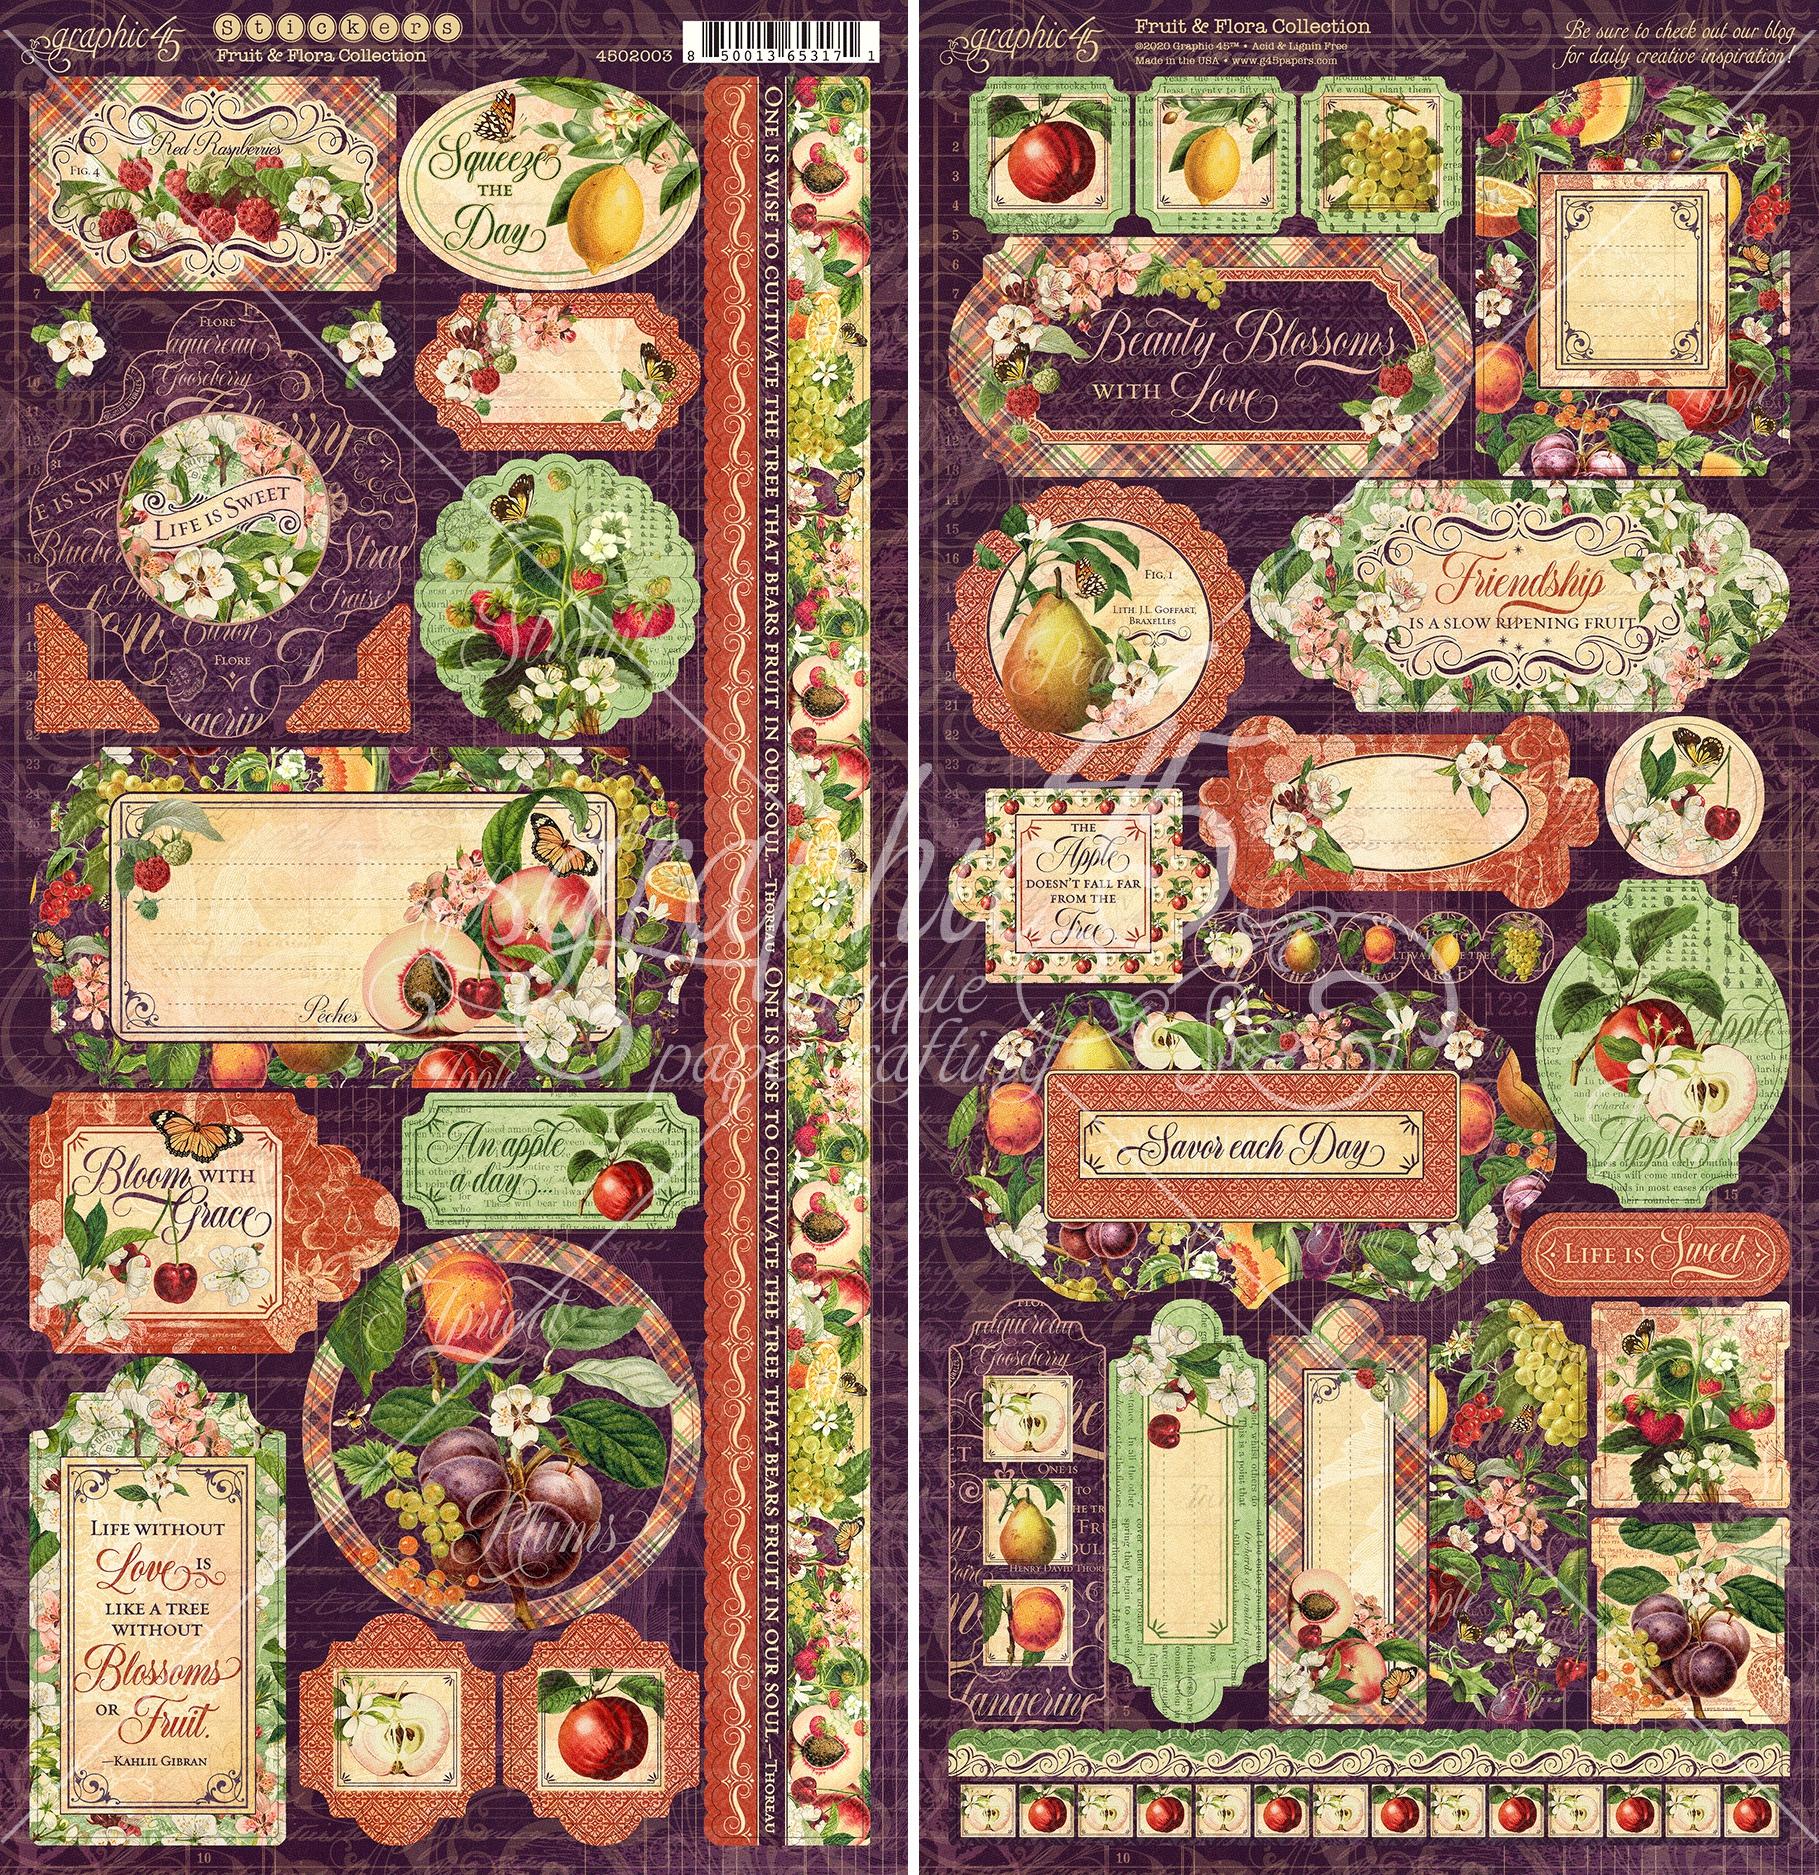 Fruit & Flora Cardstock Stickers 12X6